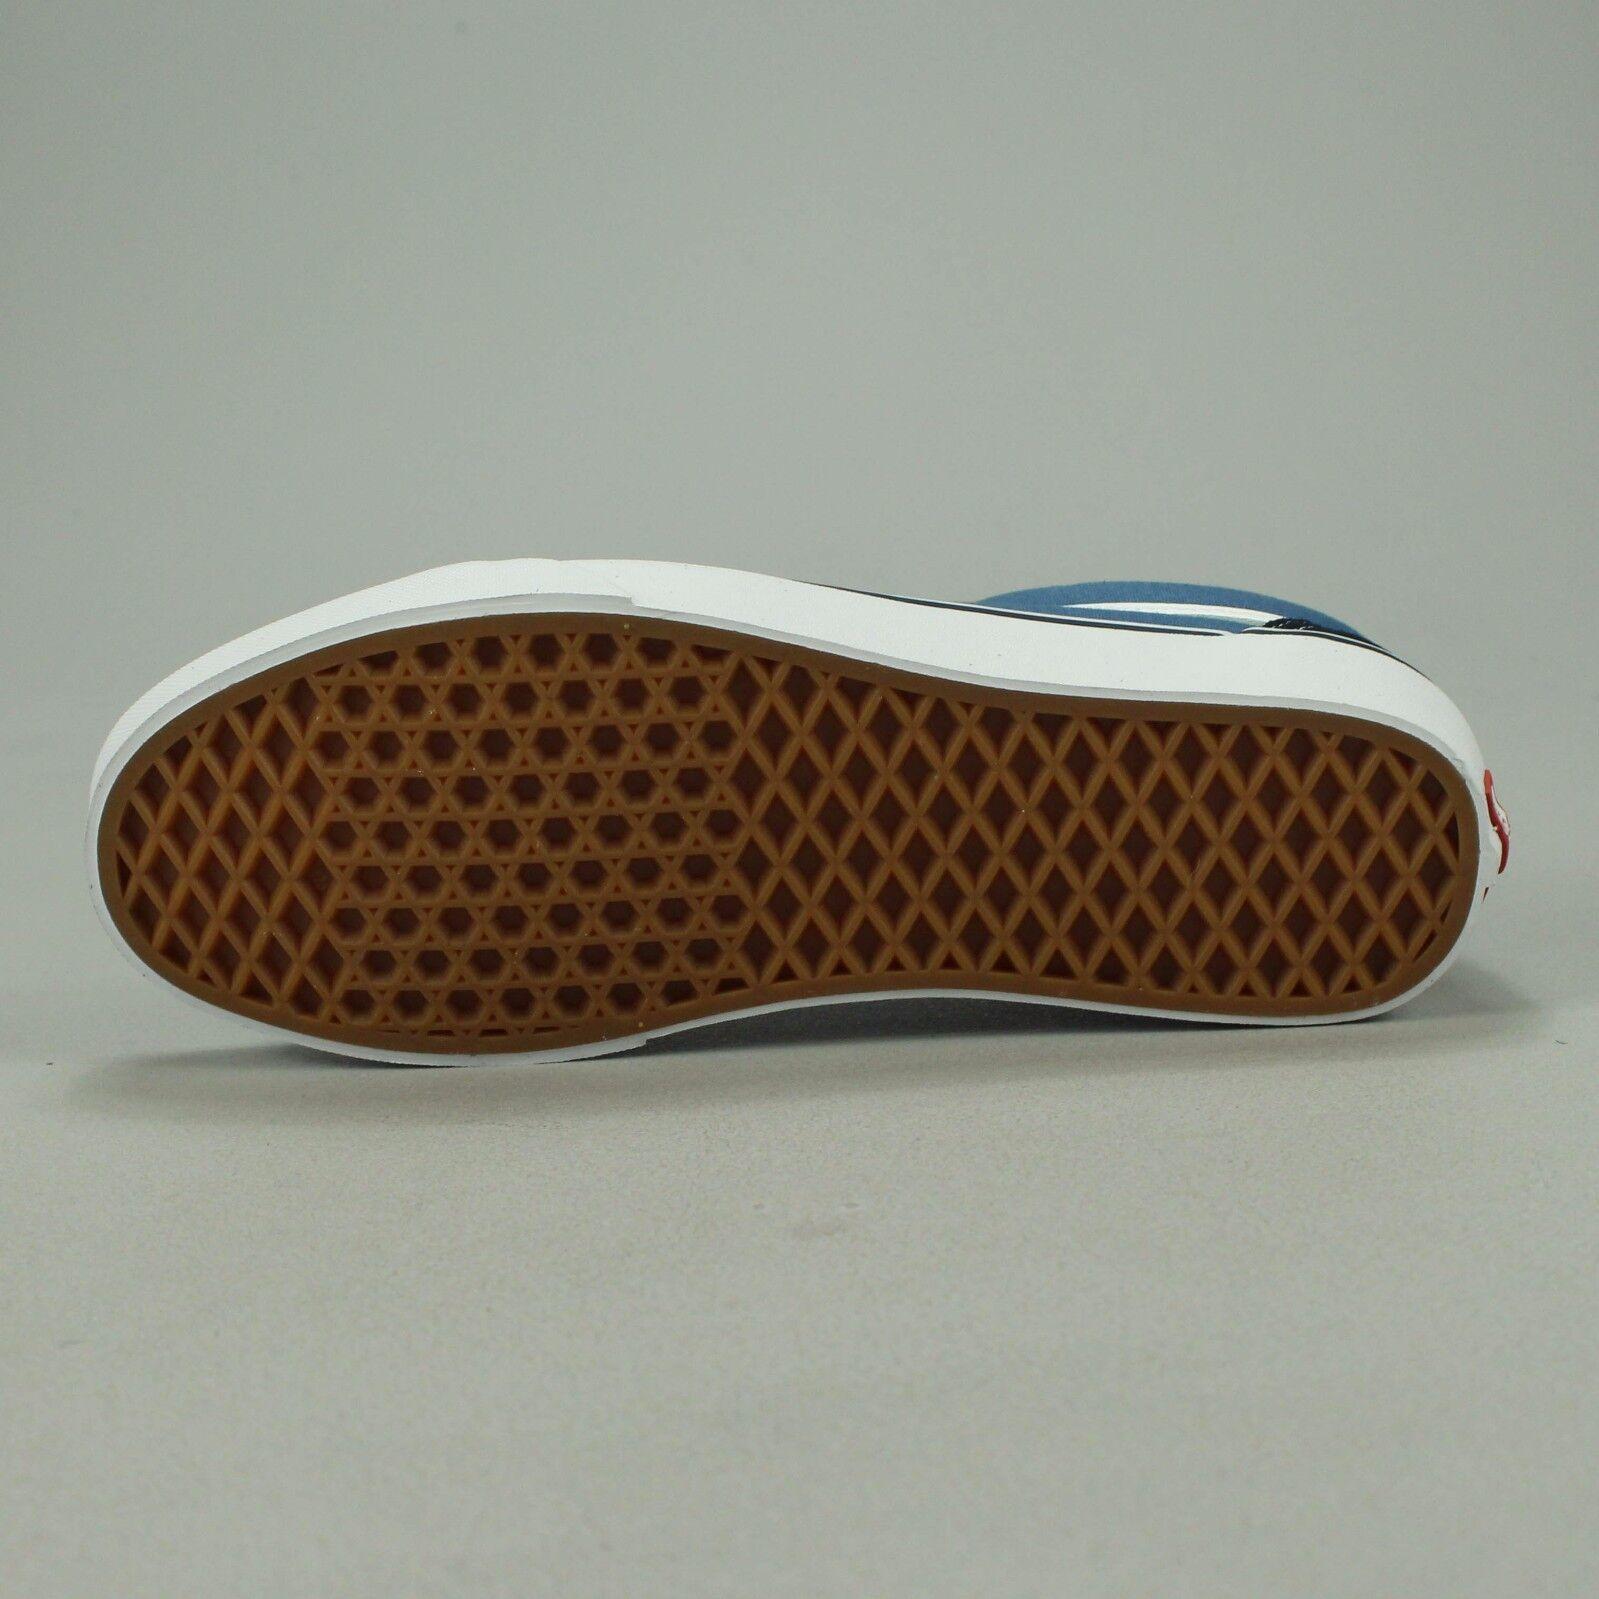 Vans Old Skool Trainers Pumps Schuhes New in box UK Größe 4, 5, 6, 7, 8,9,10,